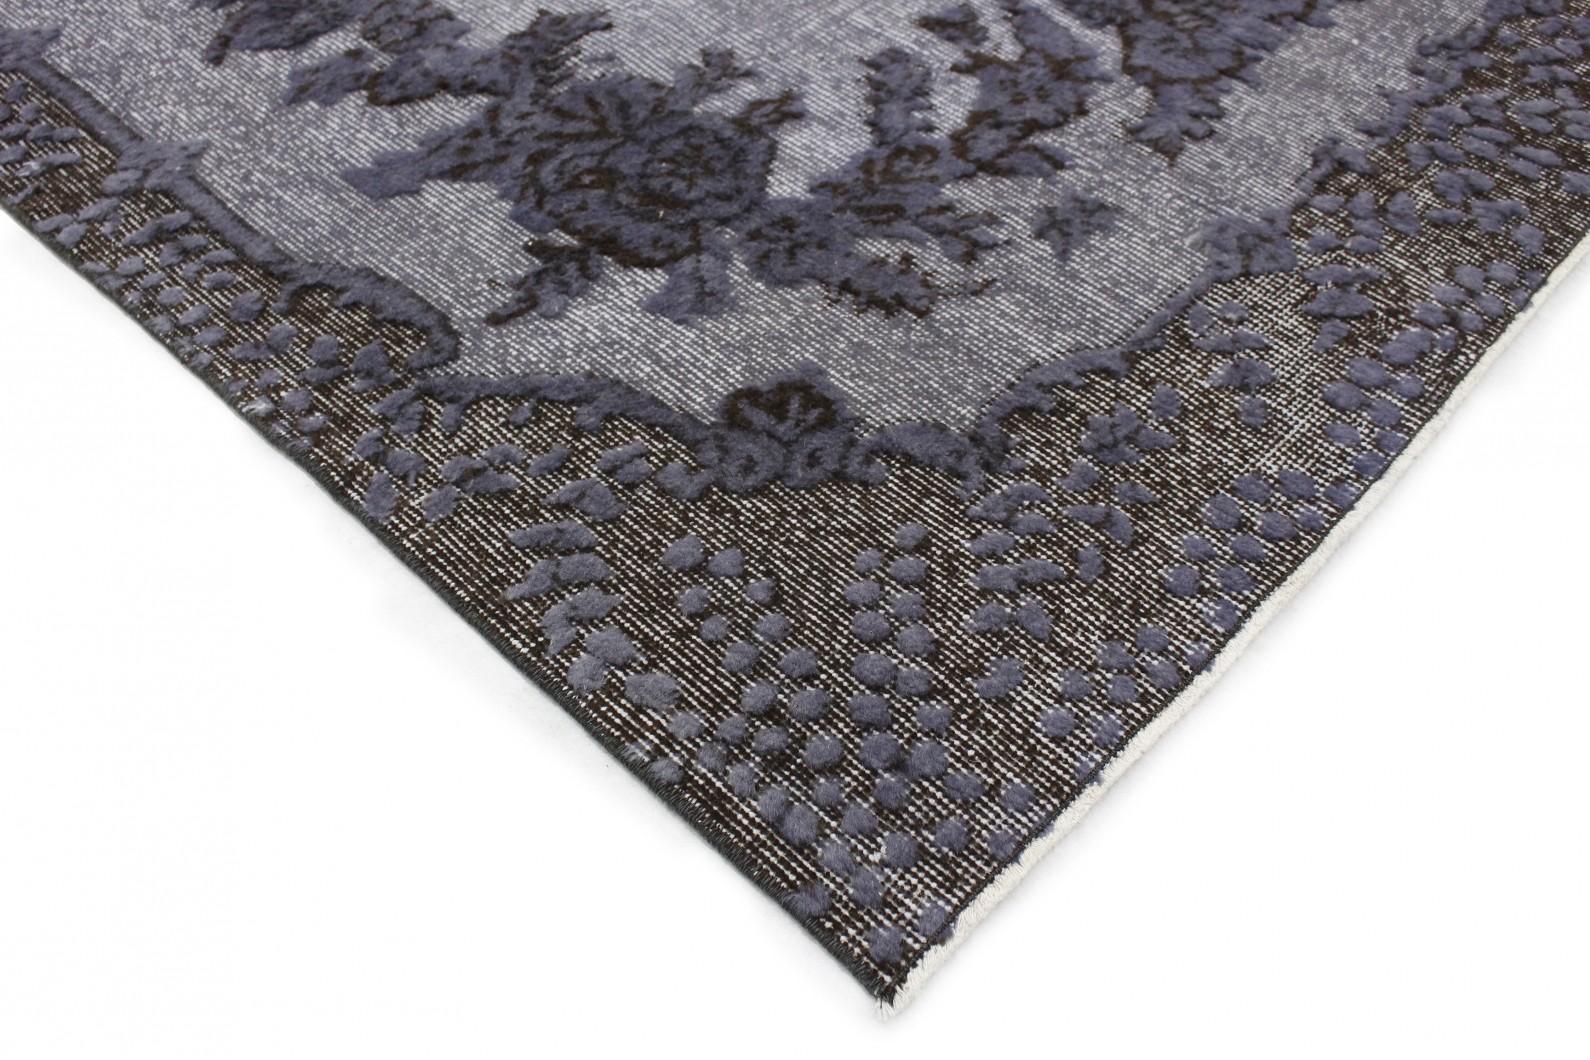 vintage teppich 3d look silber grau in 240x140 1011 6016 bei kaufen. Black Bedroom Furniture Sets. Home Design Ideas